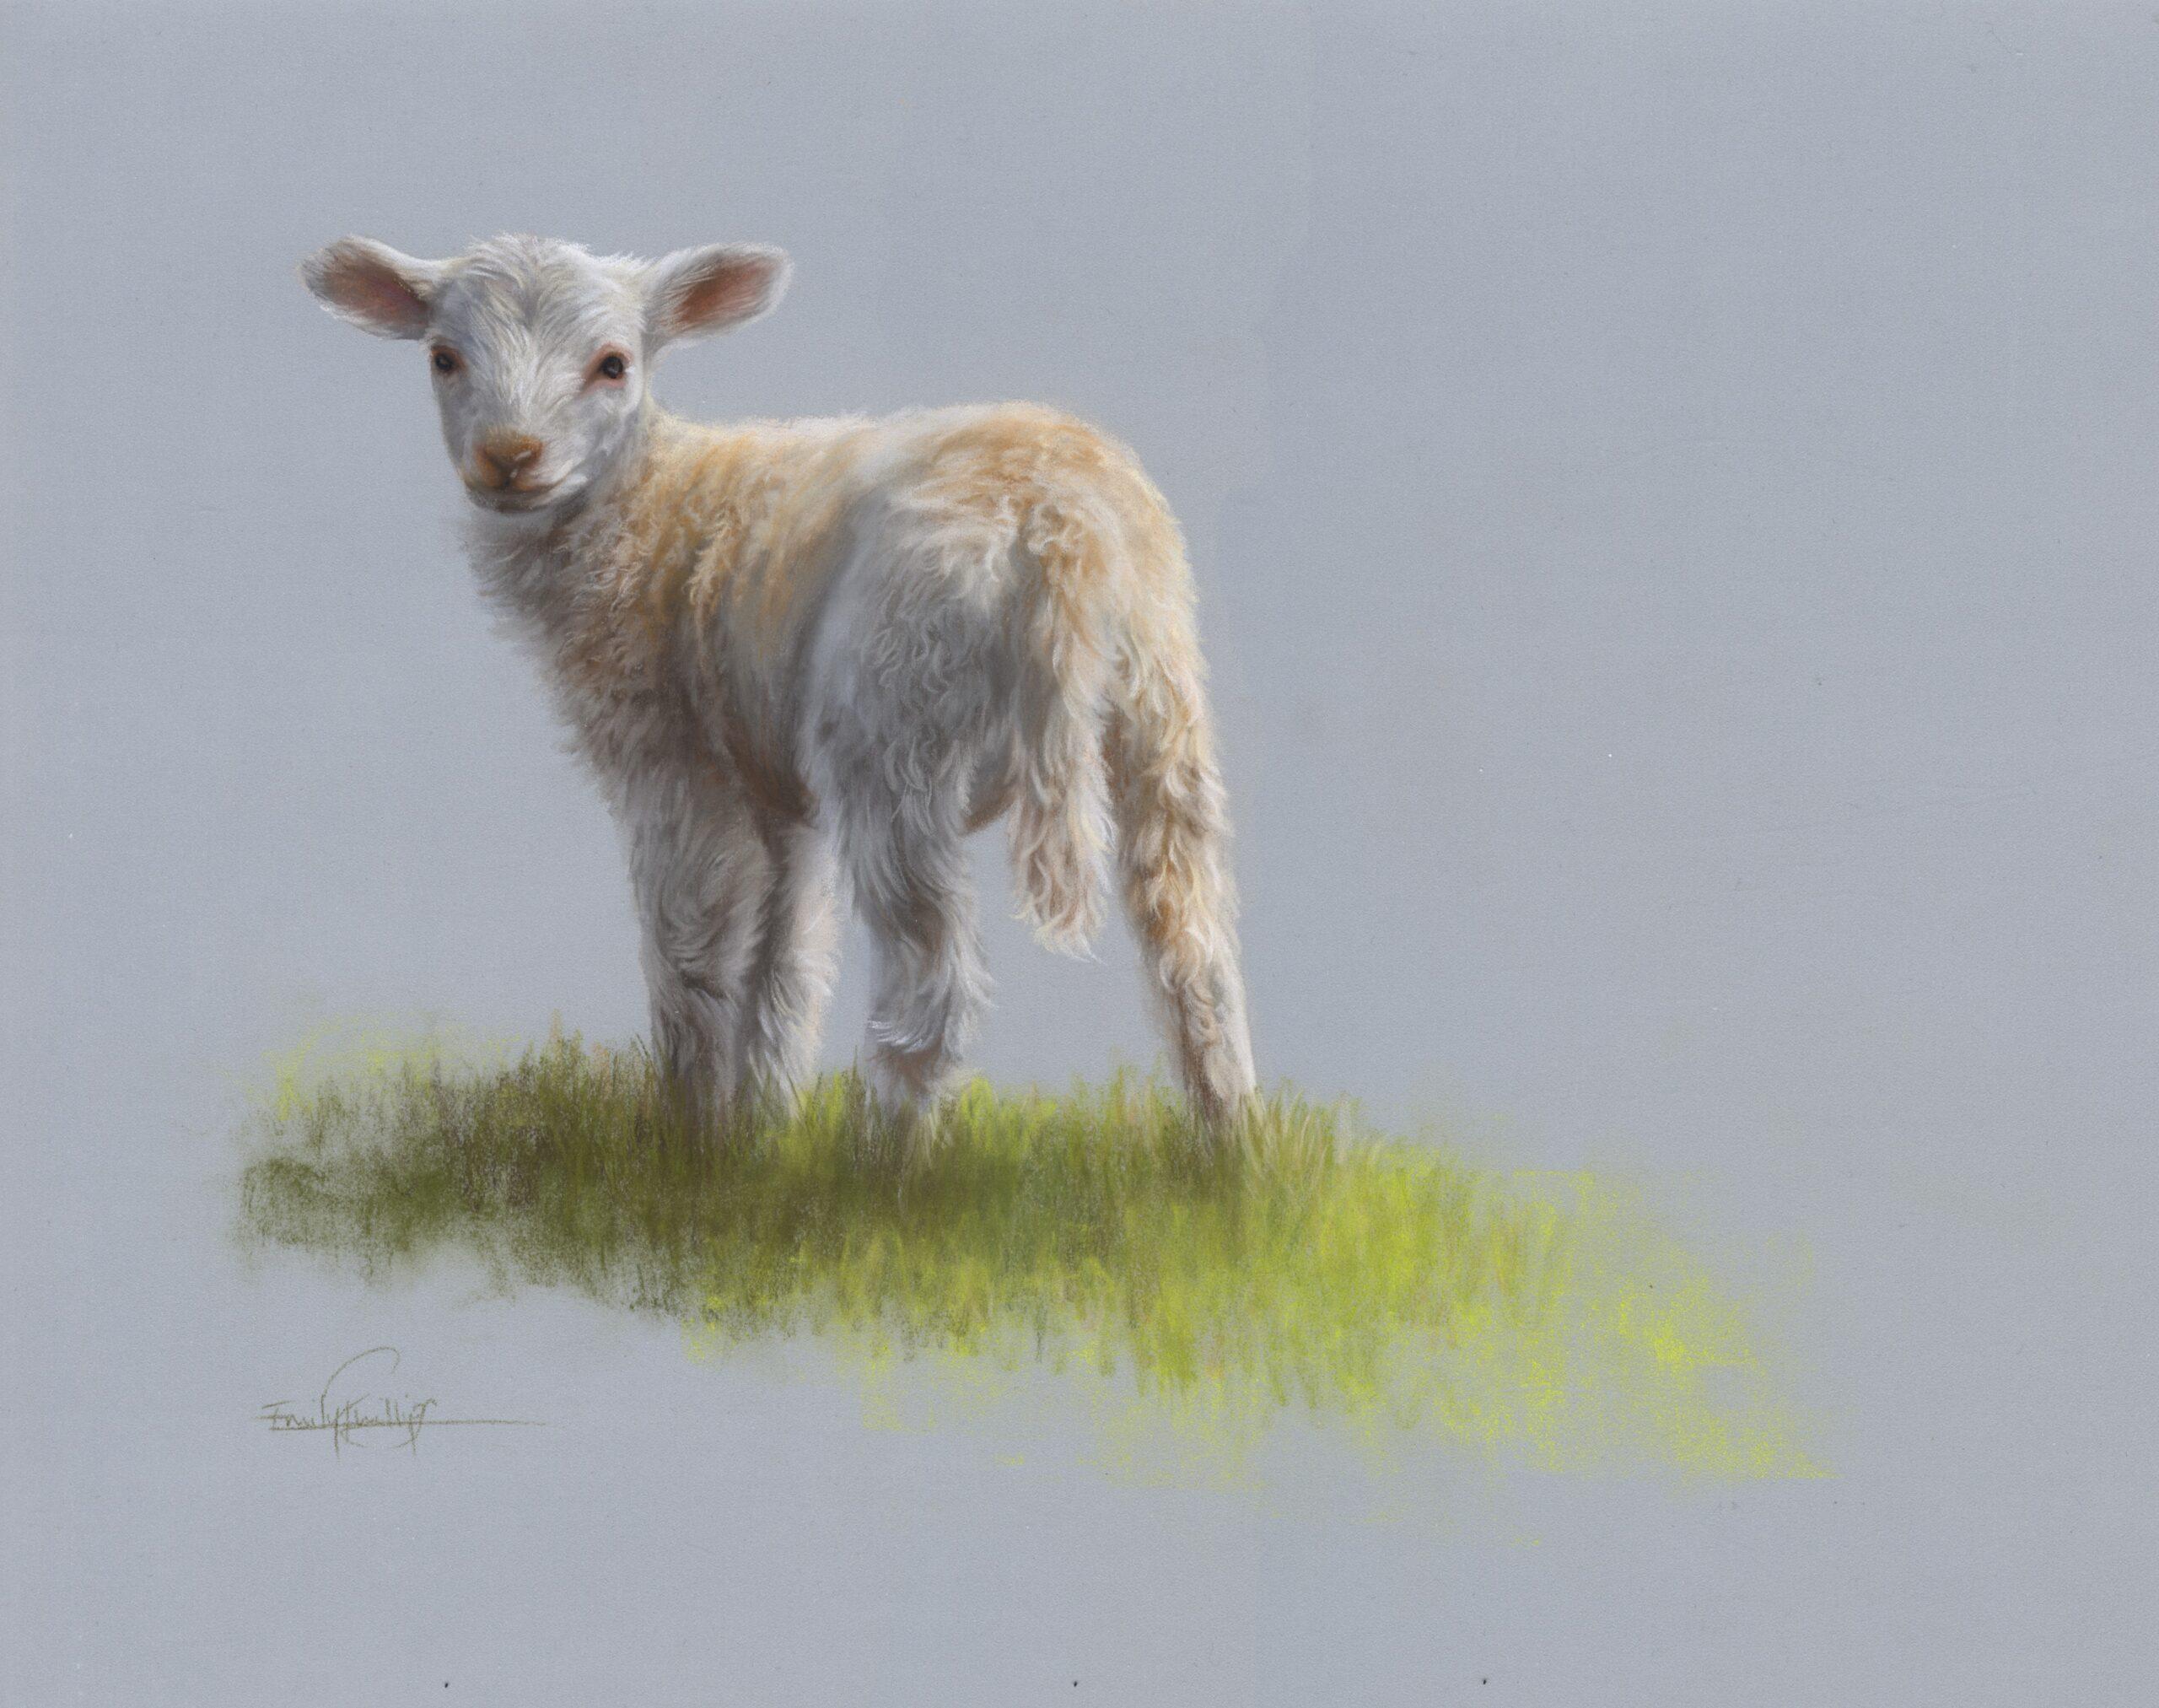 lamb drawing in pastel pencils - white fur drawing